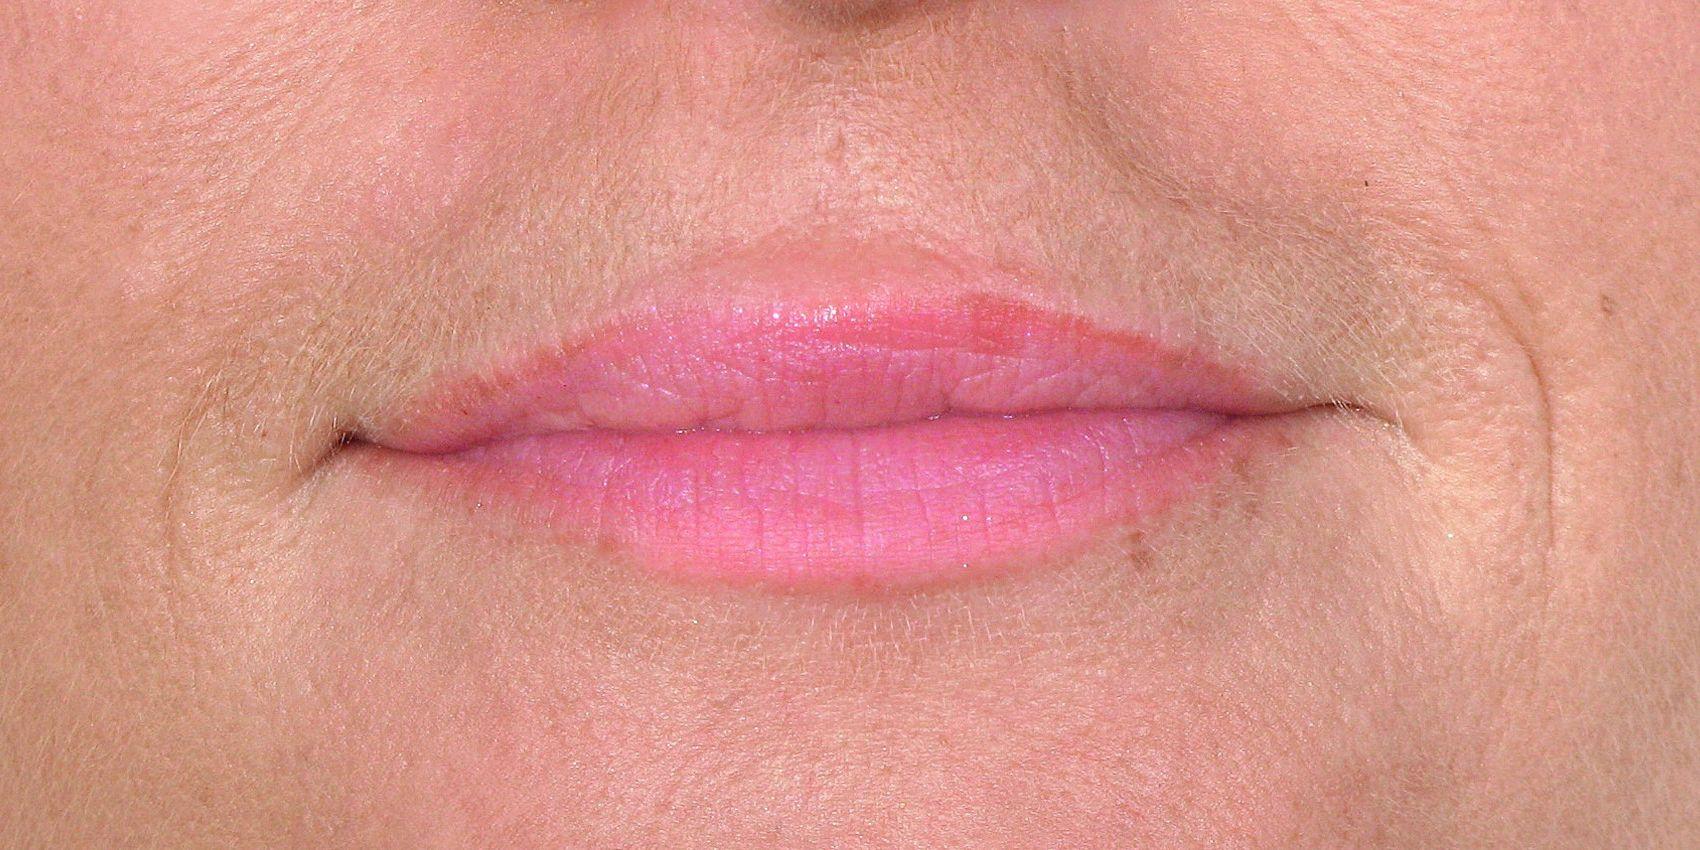 Mia_BEL_Lips_Before